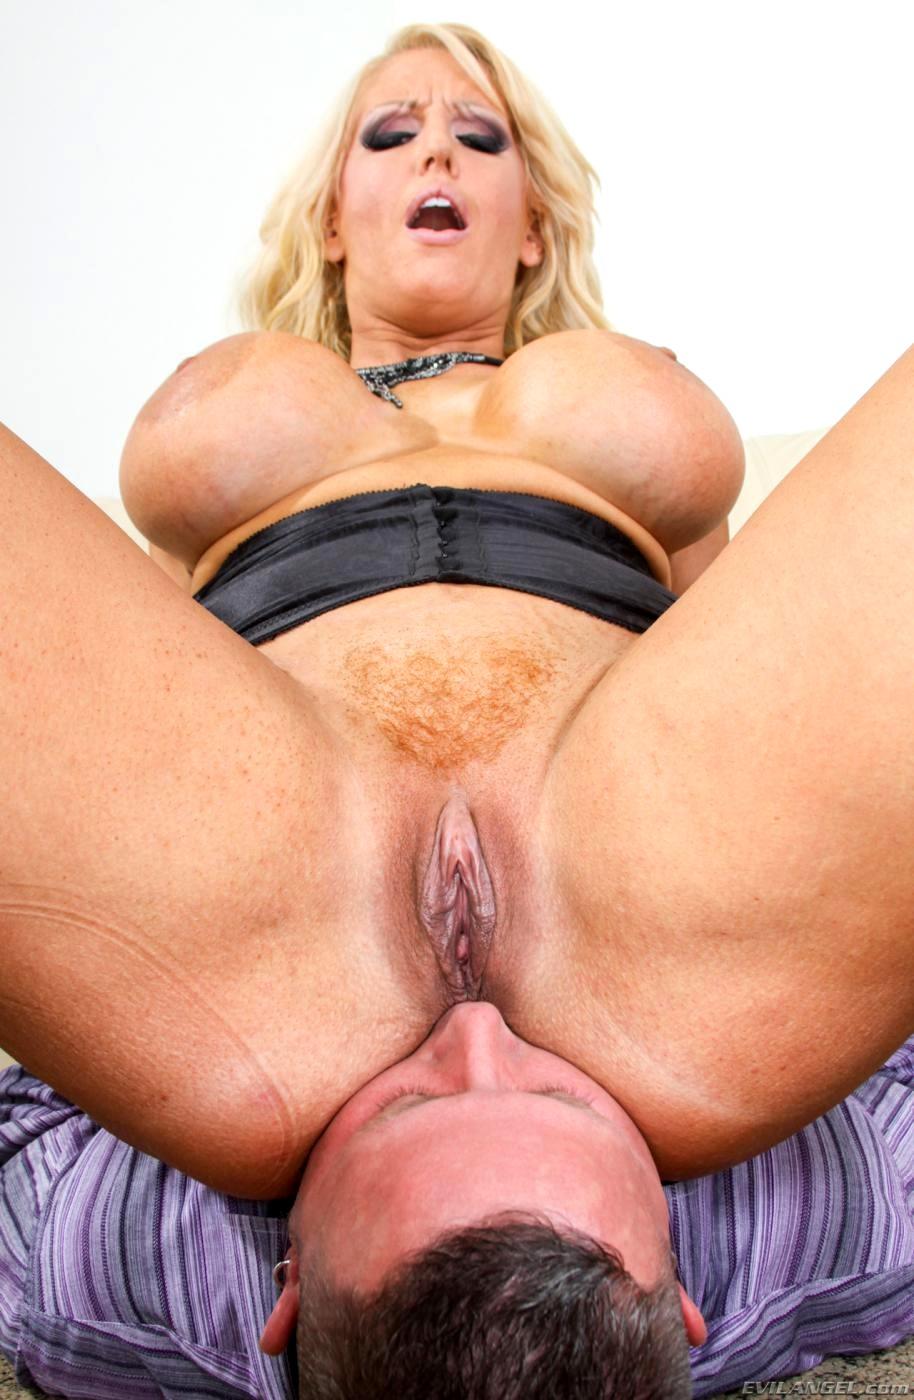 Babe Today Evil Angel Alura Jenson Latest Milf Galaxy Porn -7074